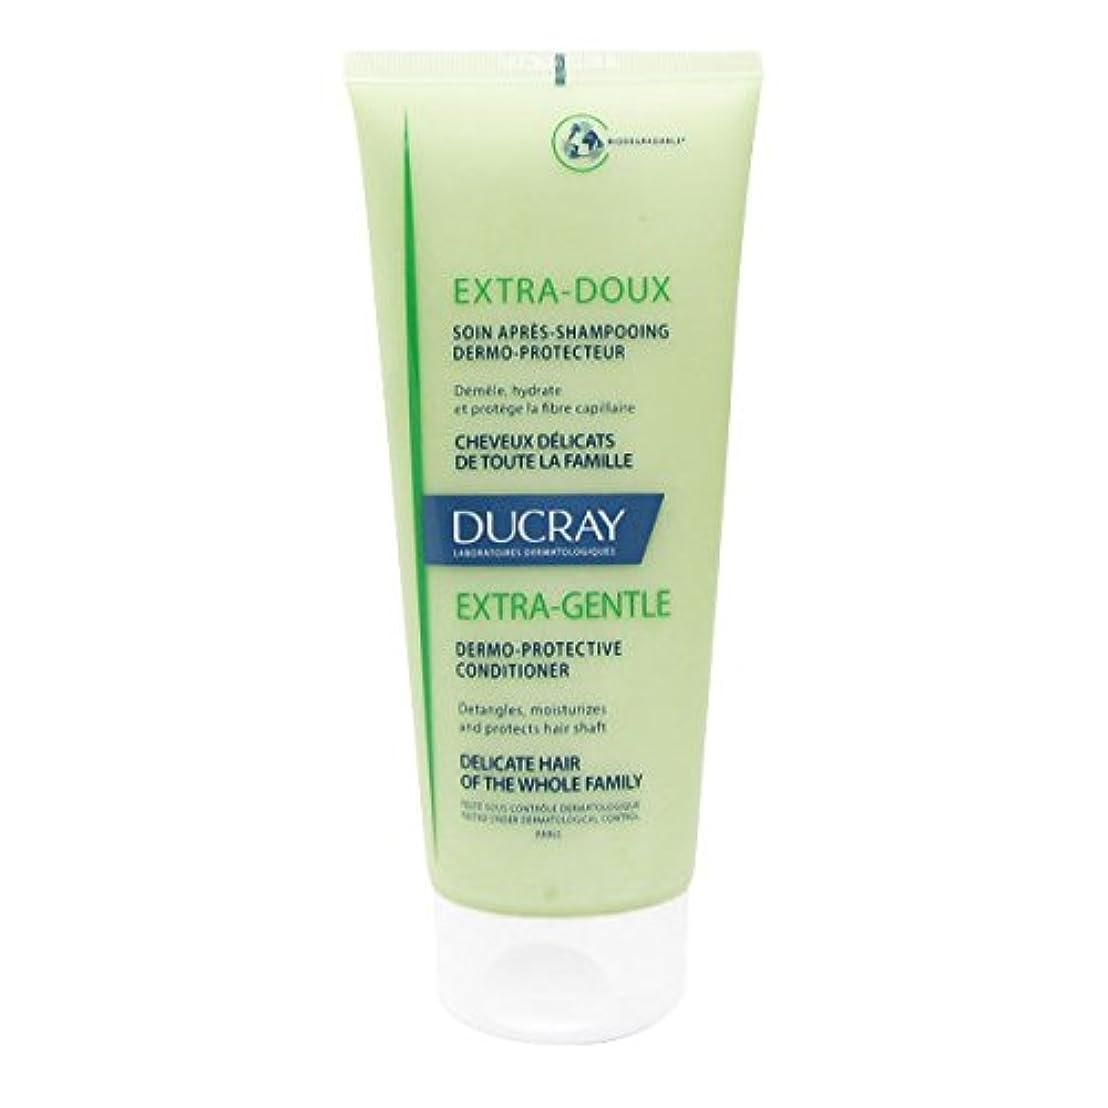 Ducray Extra Soft Hair Conditioner 200ml [並行輸入品]